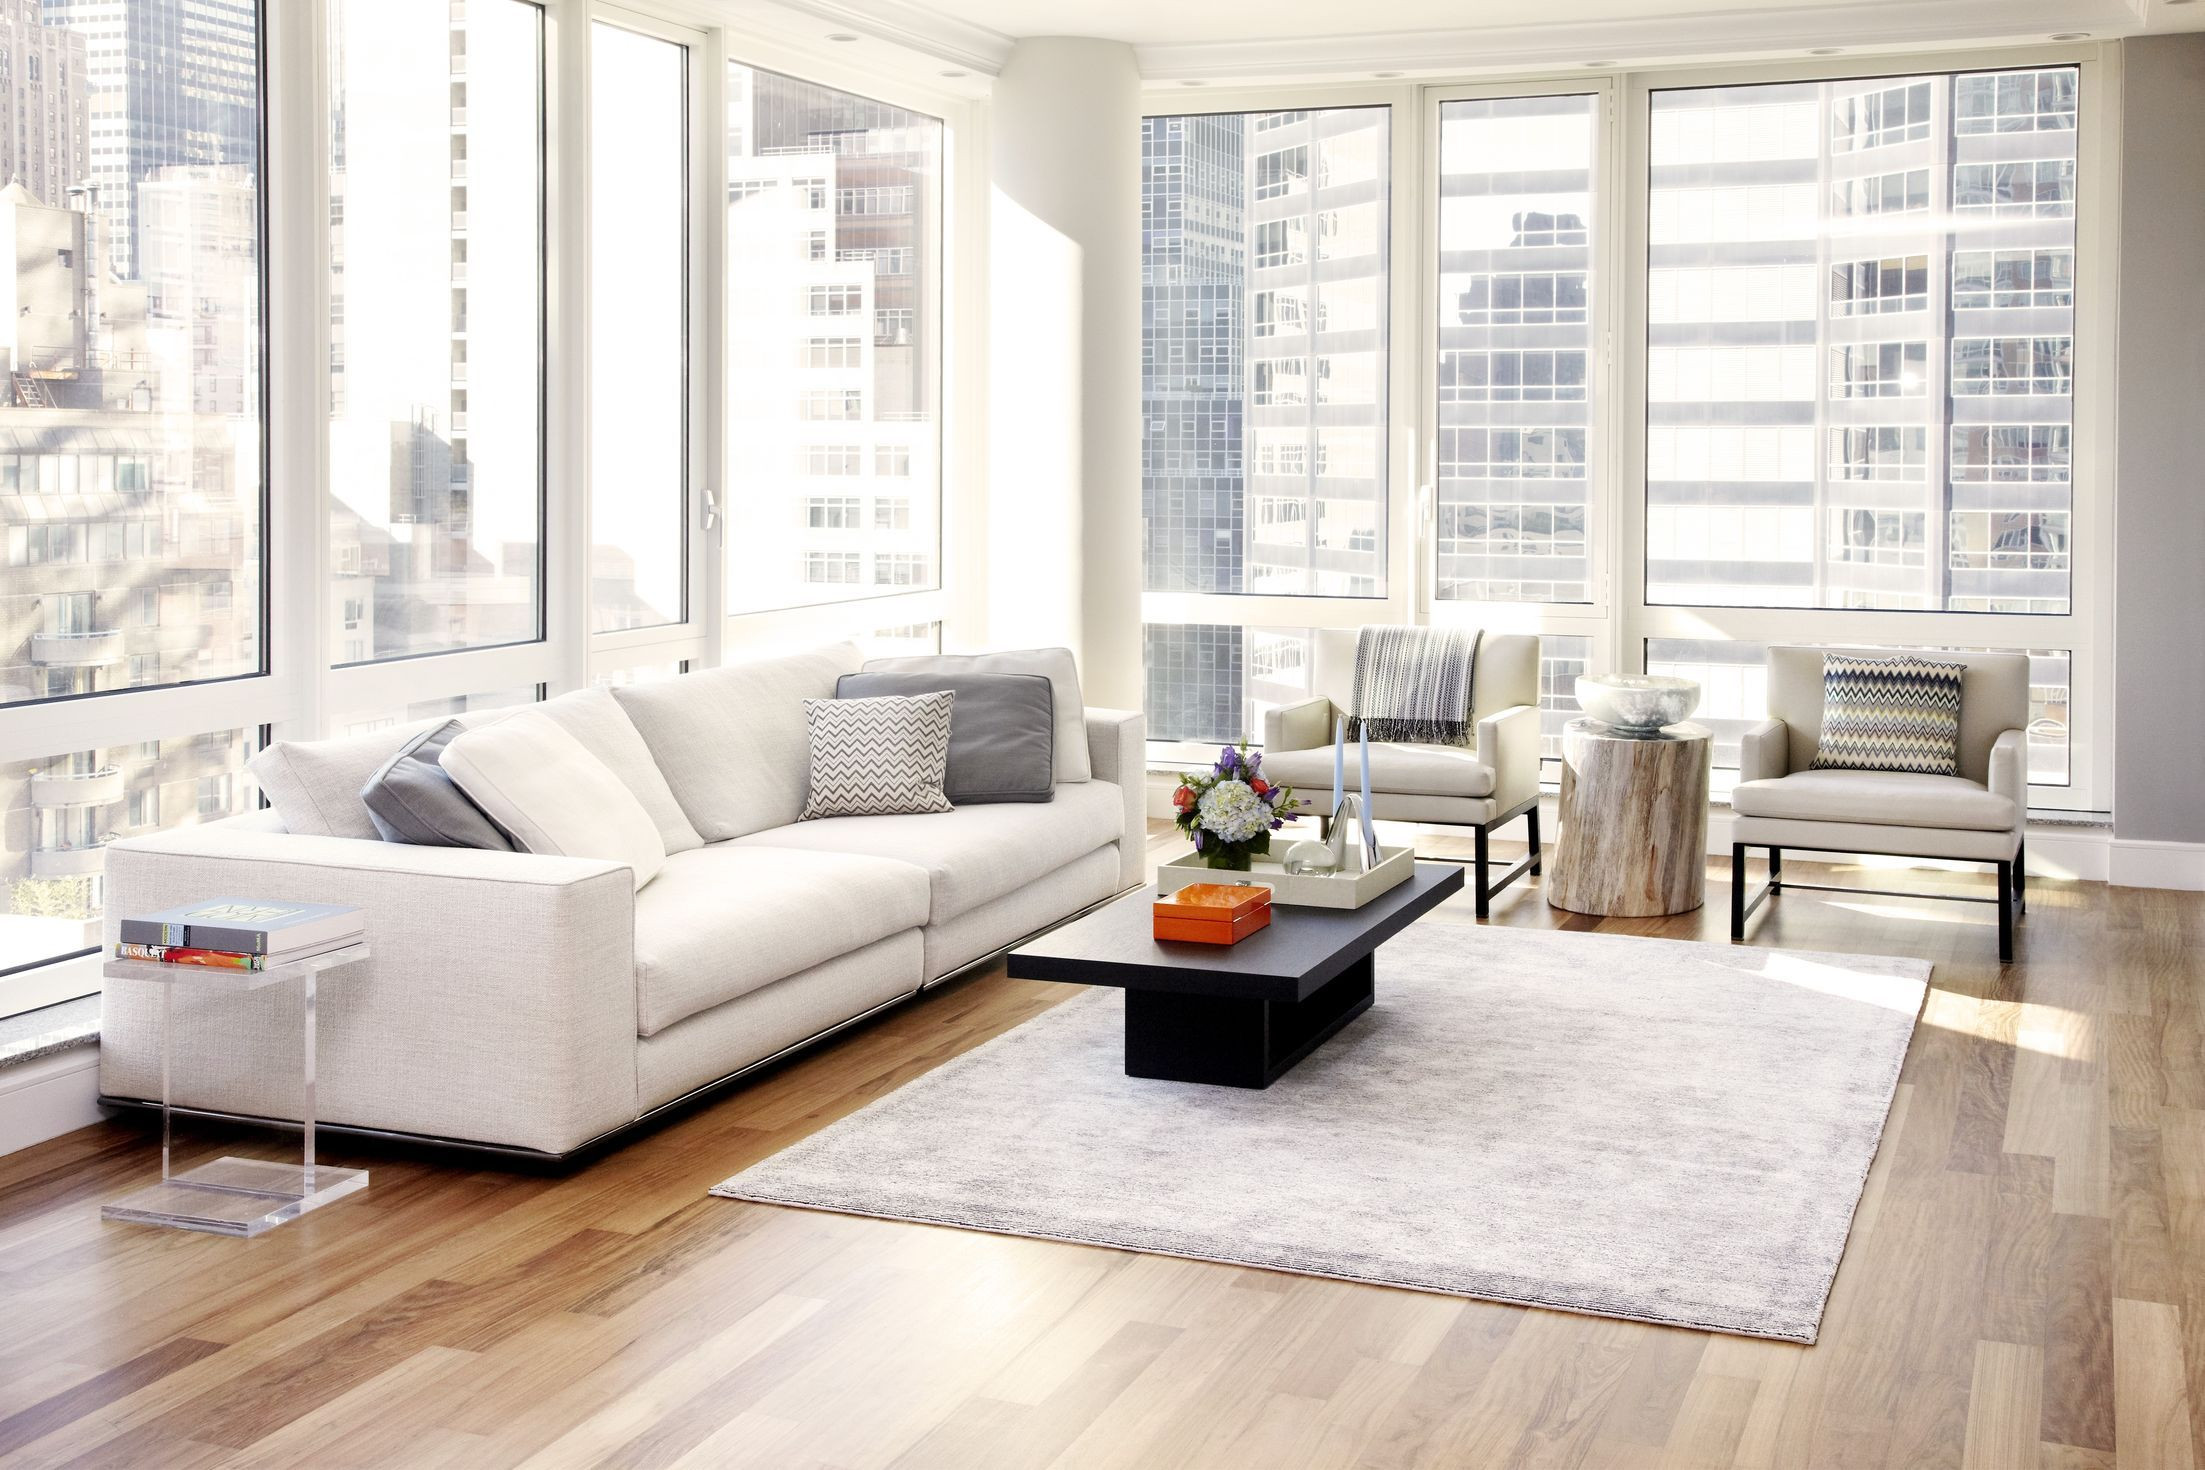 Best ideas about Wayfair Living Room Furniture . Save or Pin Best 25 Wayfair living room furniture ideas on Pinterest Now.